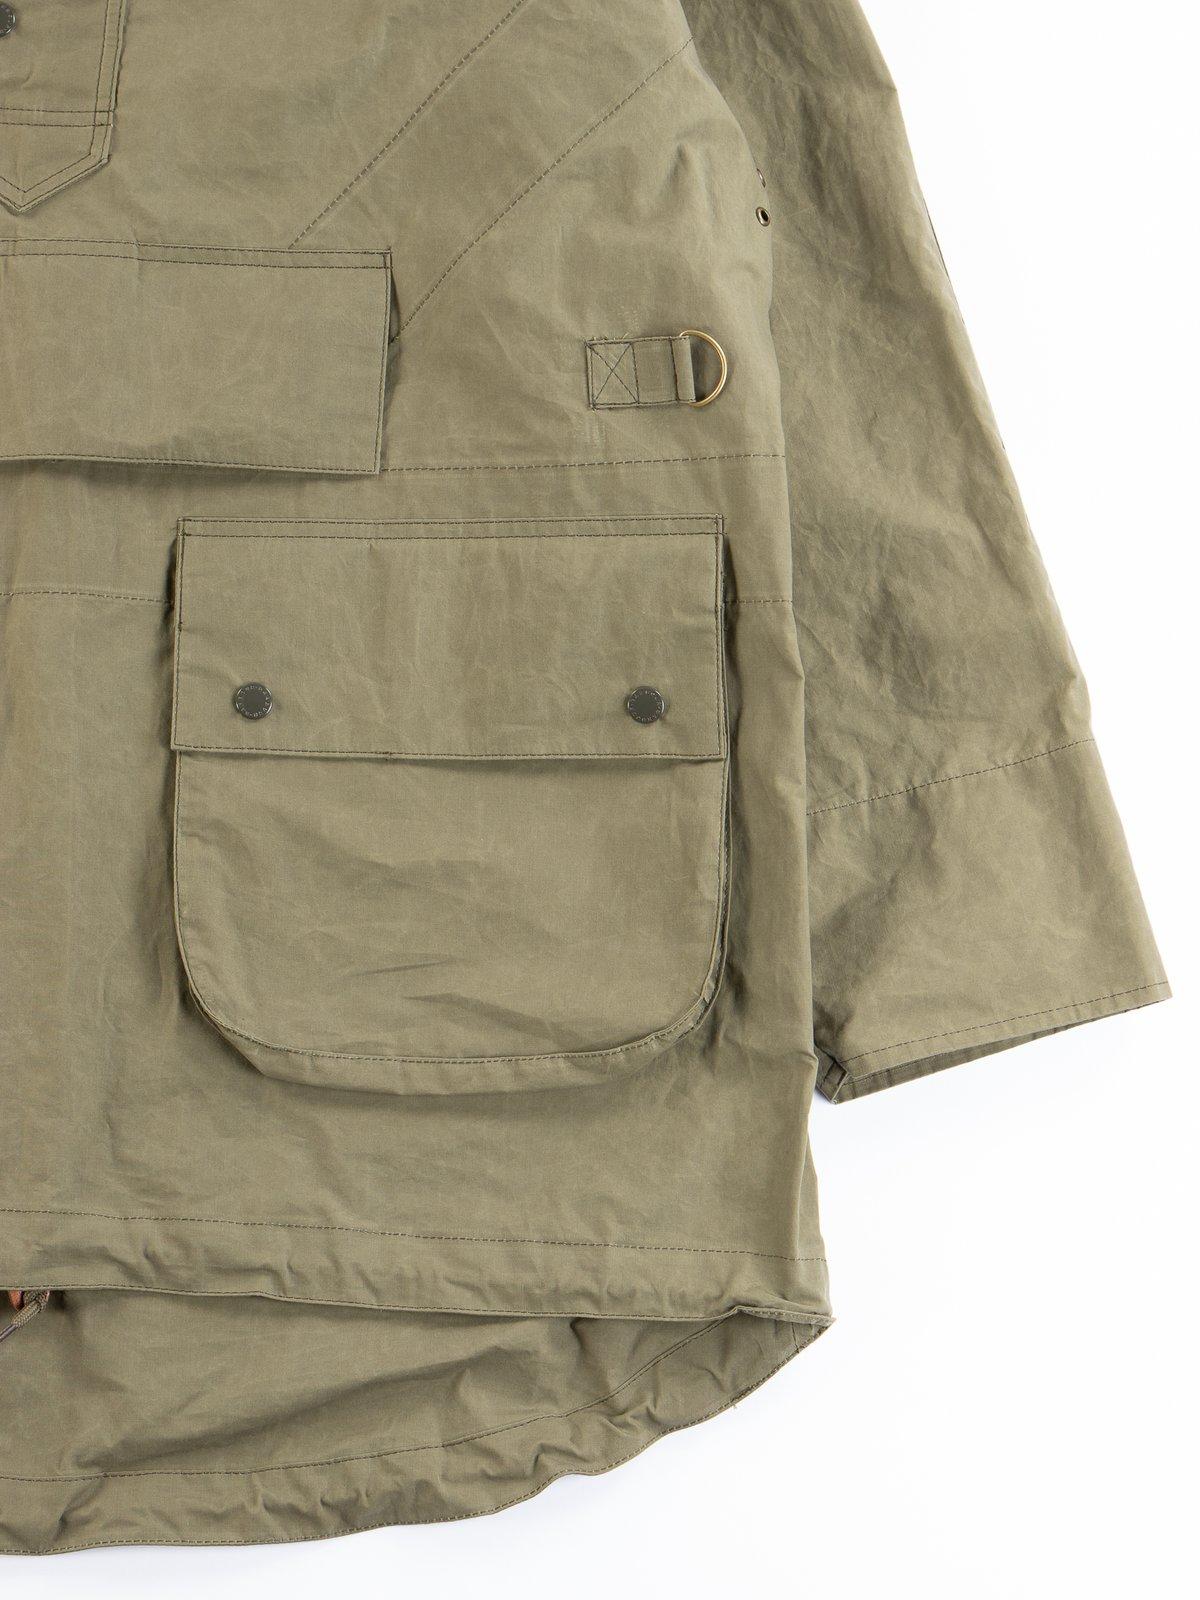 Olive Warby Jacket - Image 4